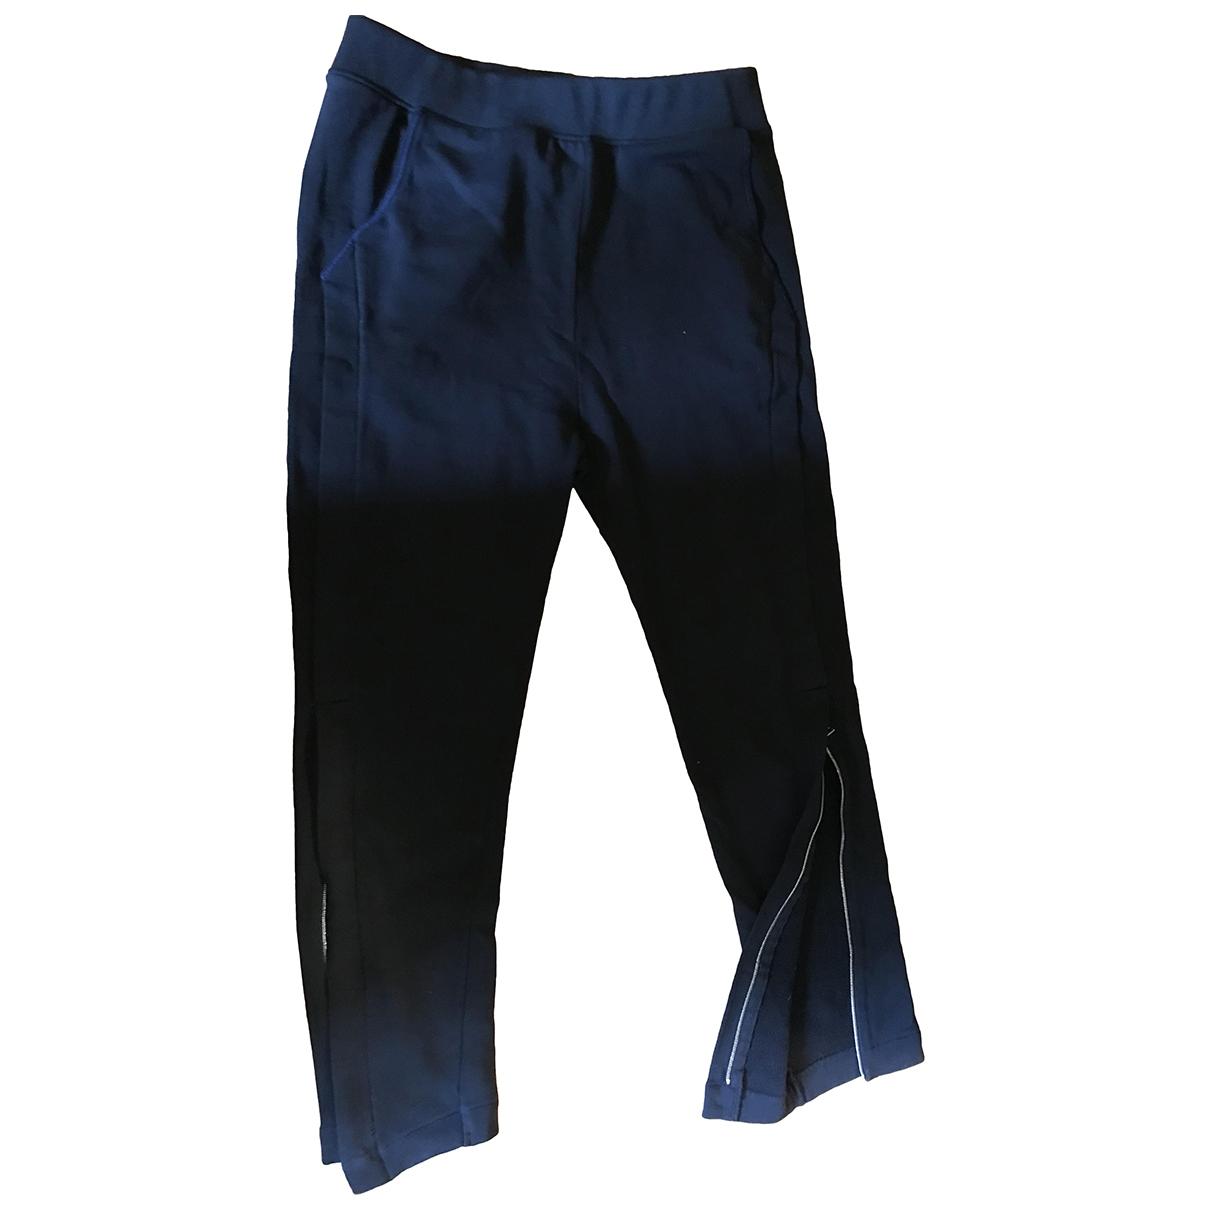 Acne Studios \N Black Cotton Trousers for Women M International